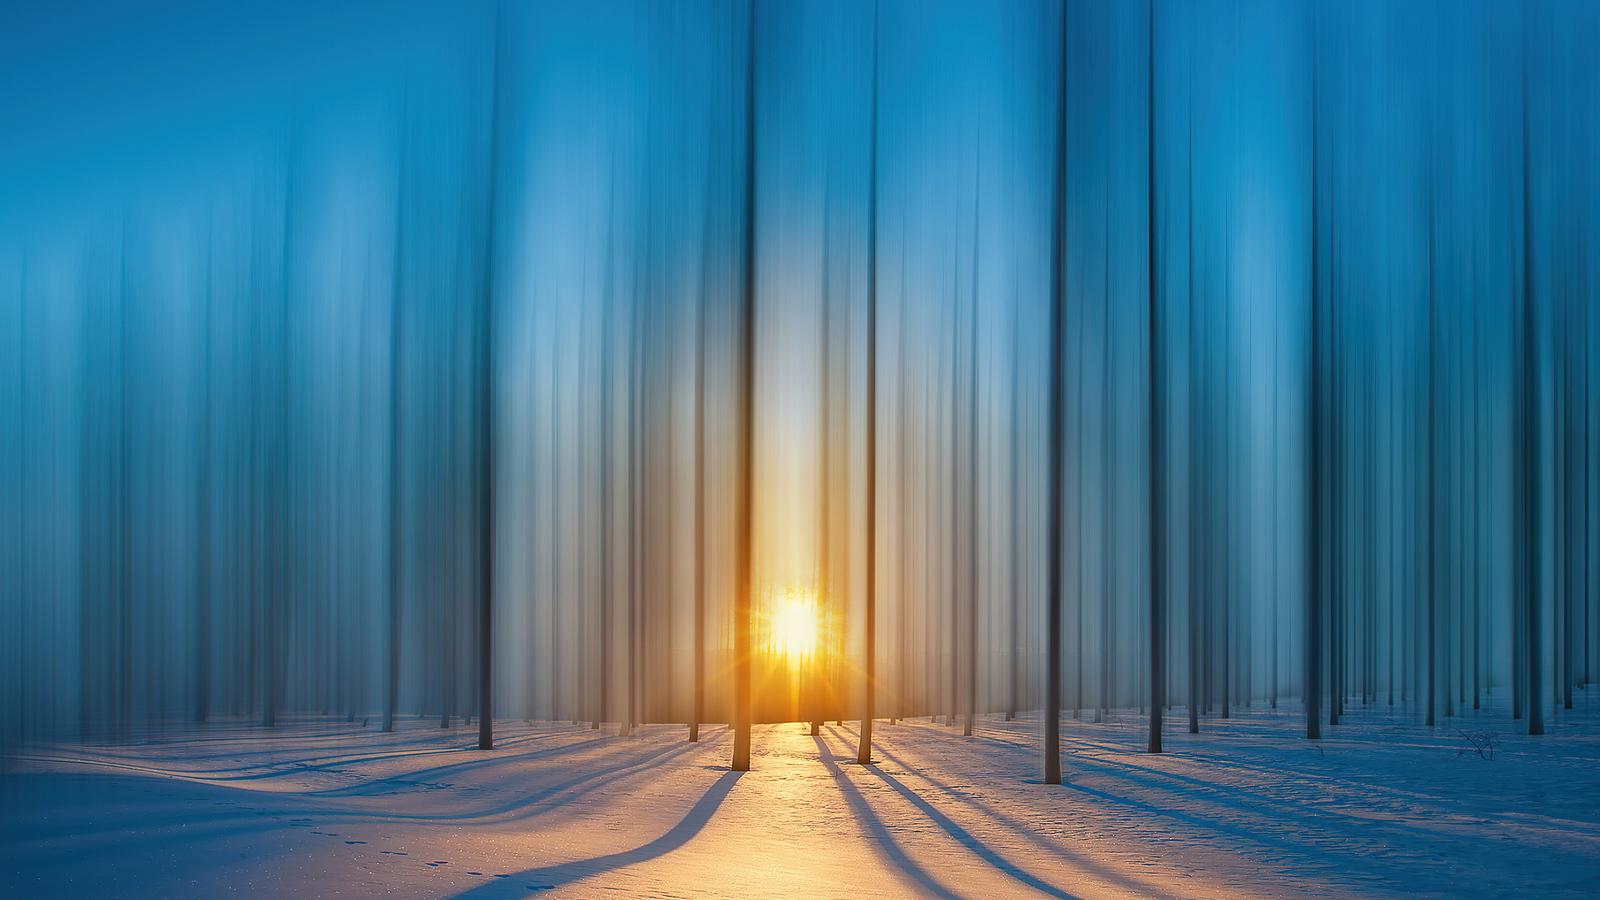 cold-snow-trees-4k-bg.jpg